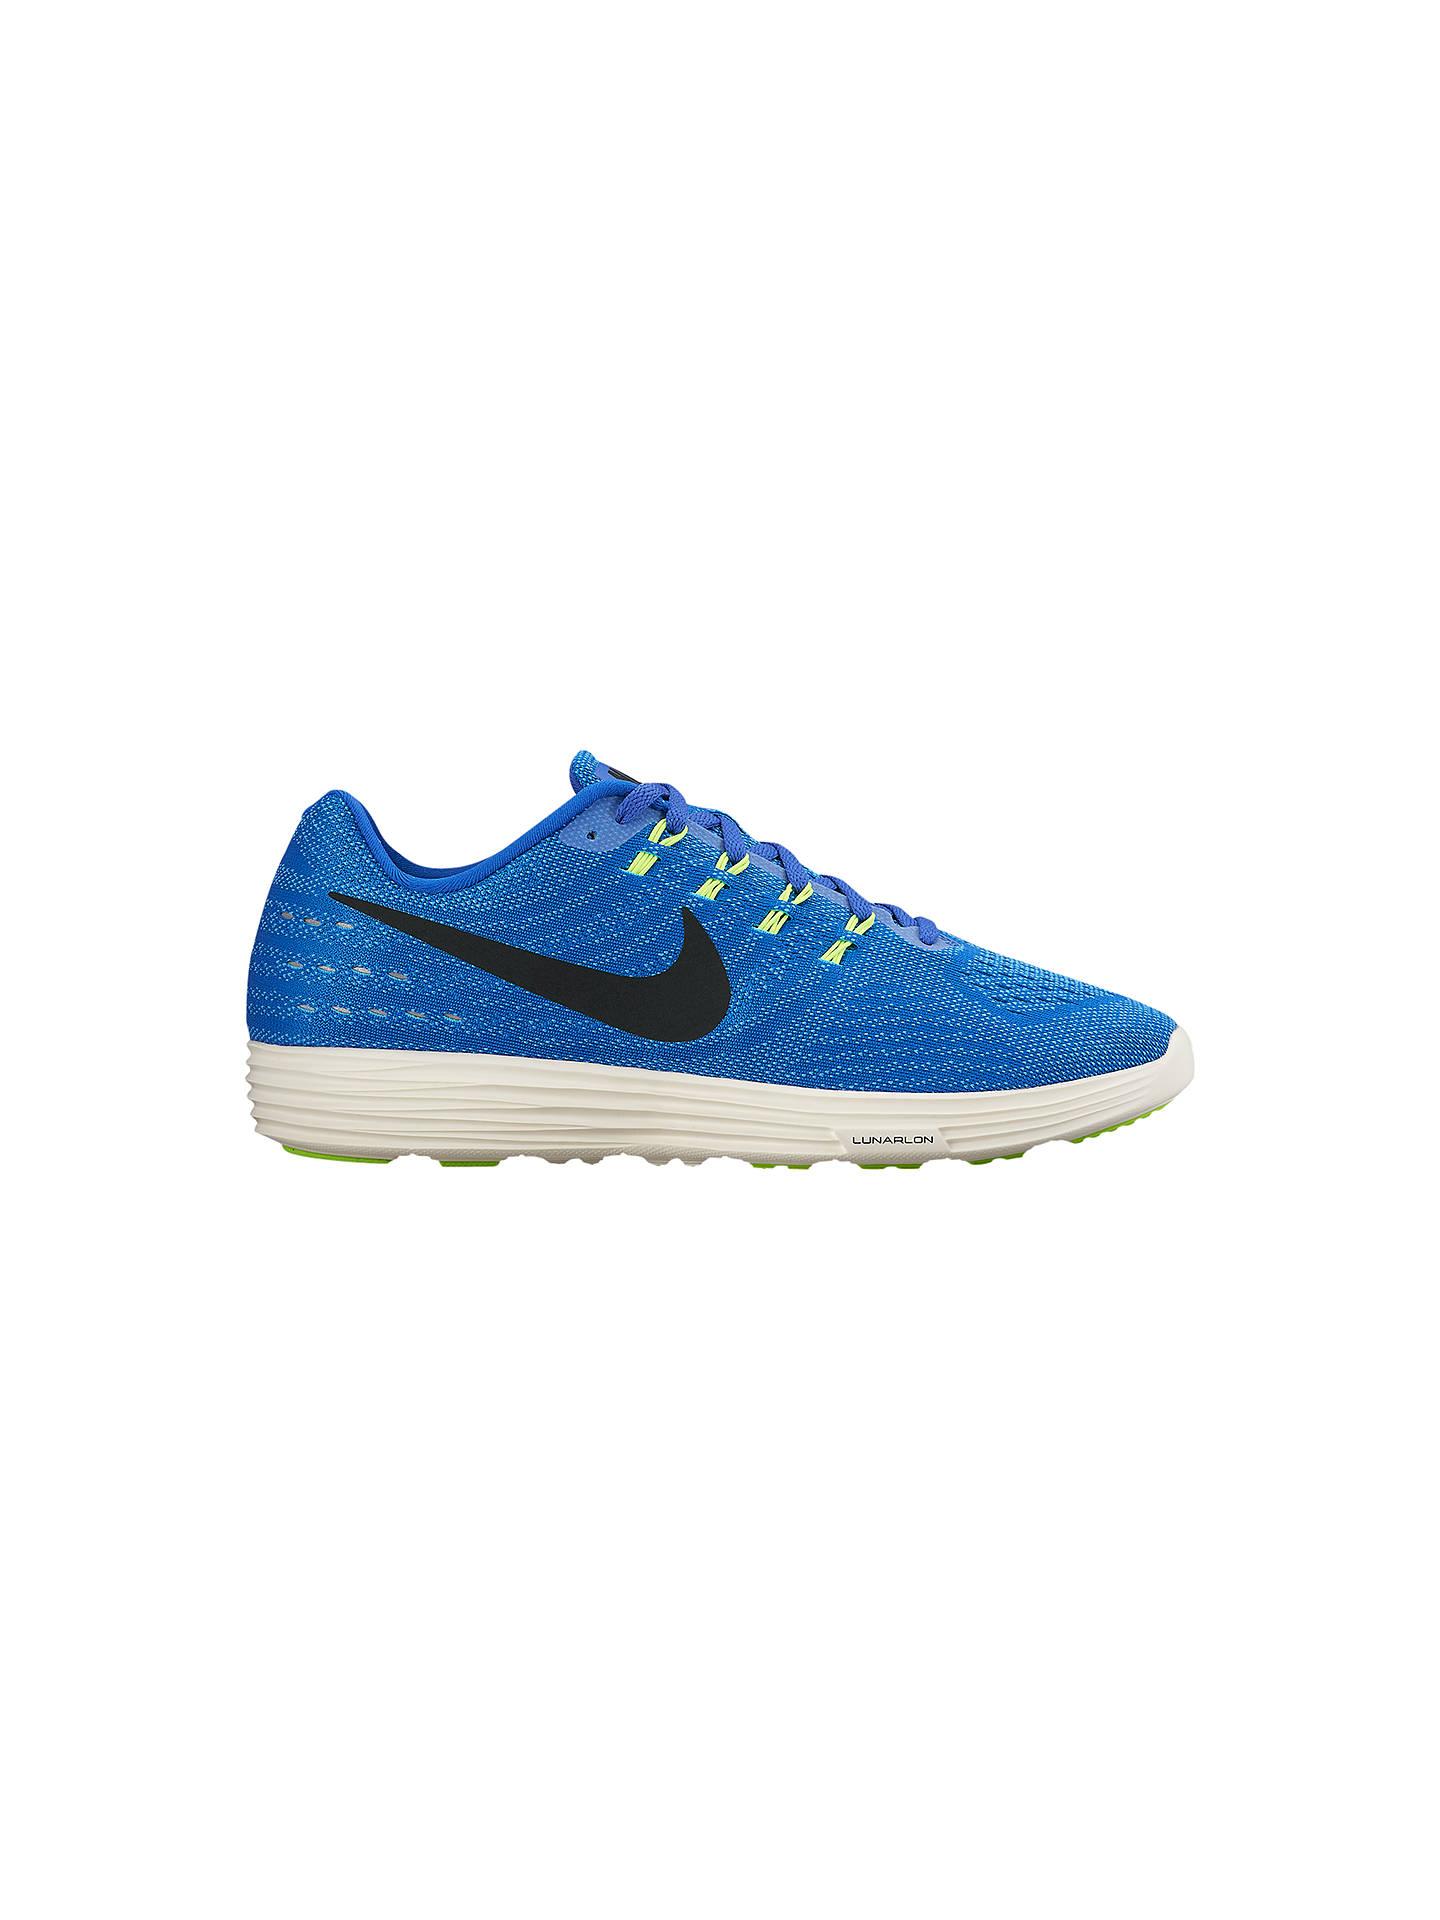 san francisco e528c 54b7f Buy Nike LunarTempo 2 Men s Running Shoes, Blue Black, 7 Online at  johnlewis ...